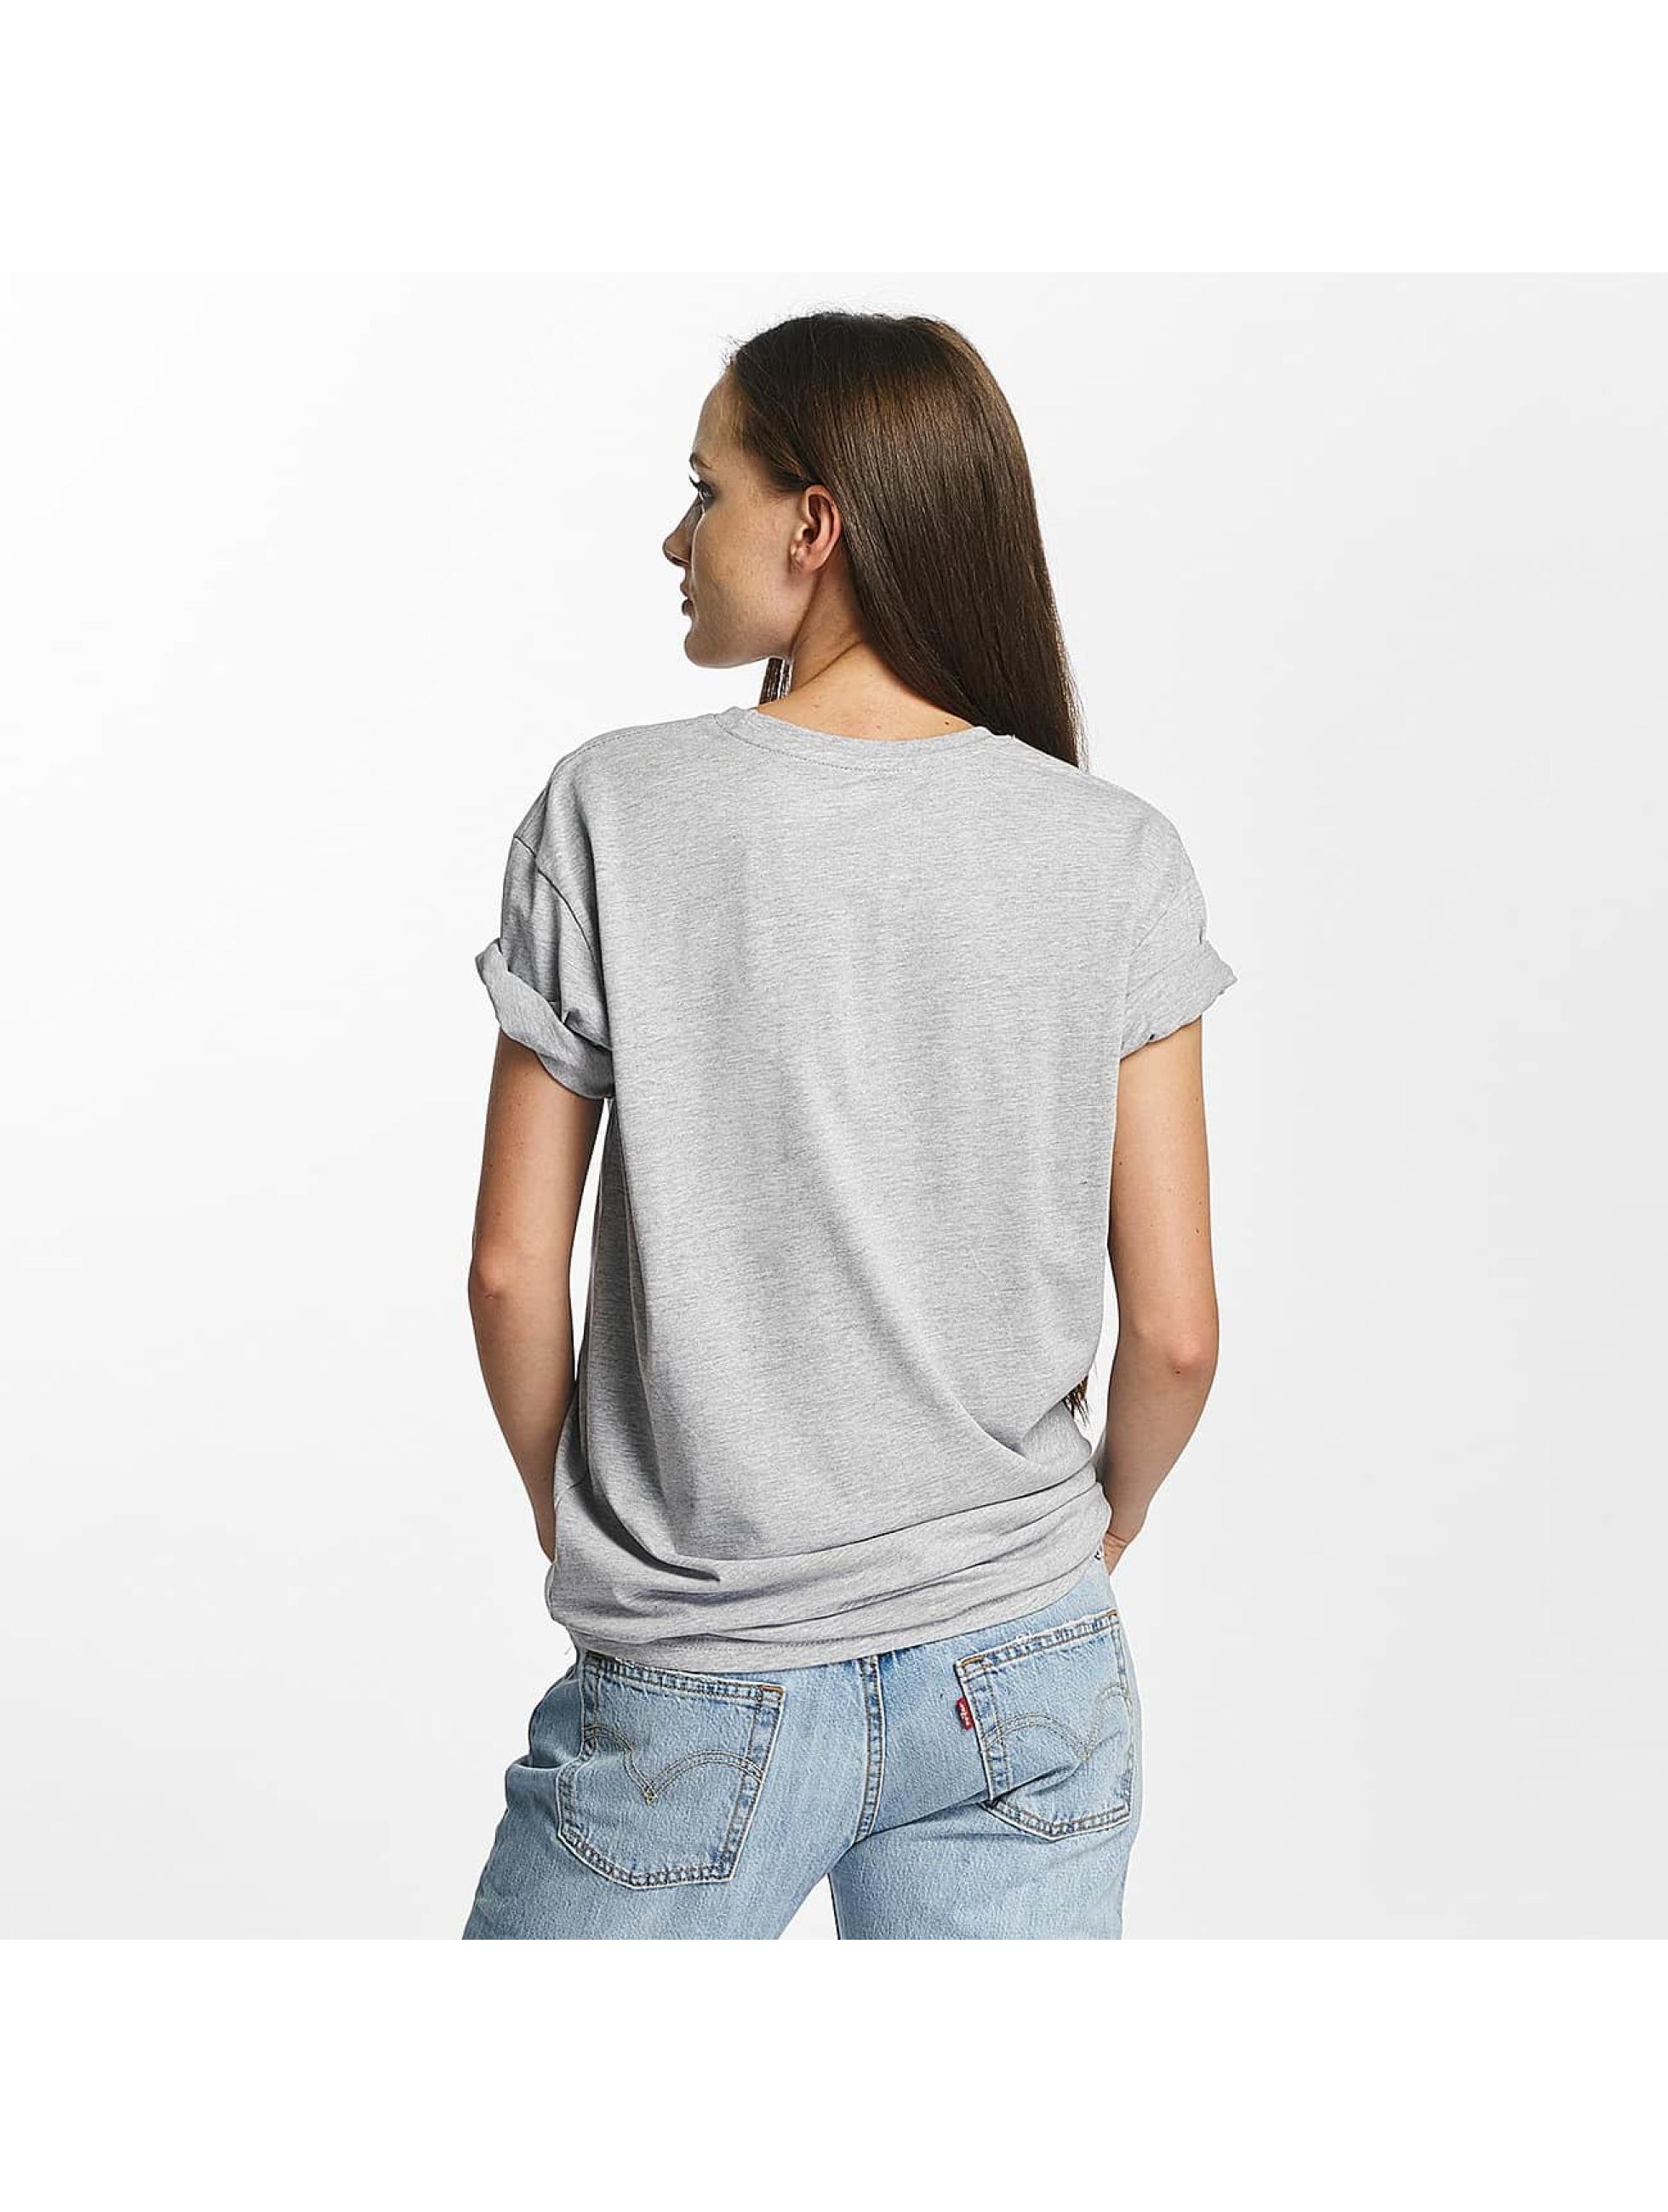 Cyprime T-Shirt Holmium Oversized grau